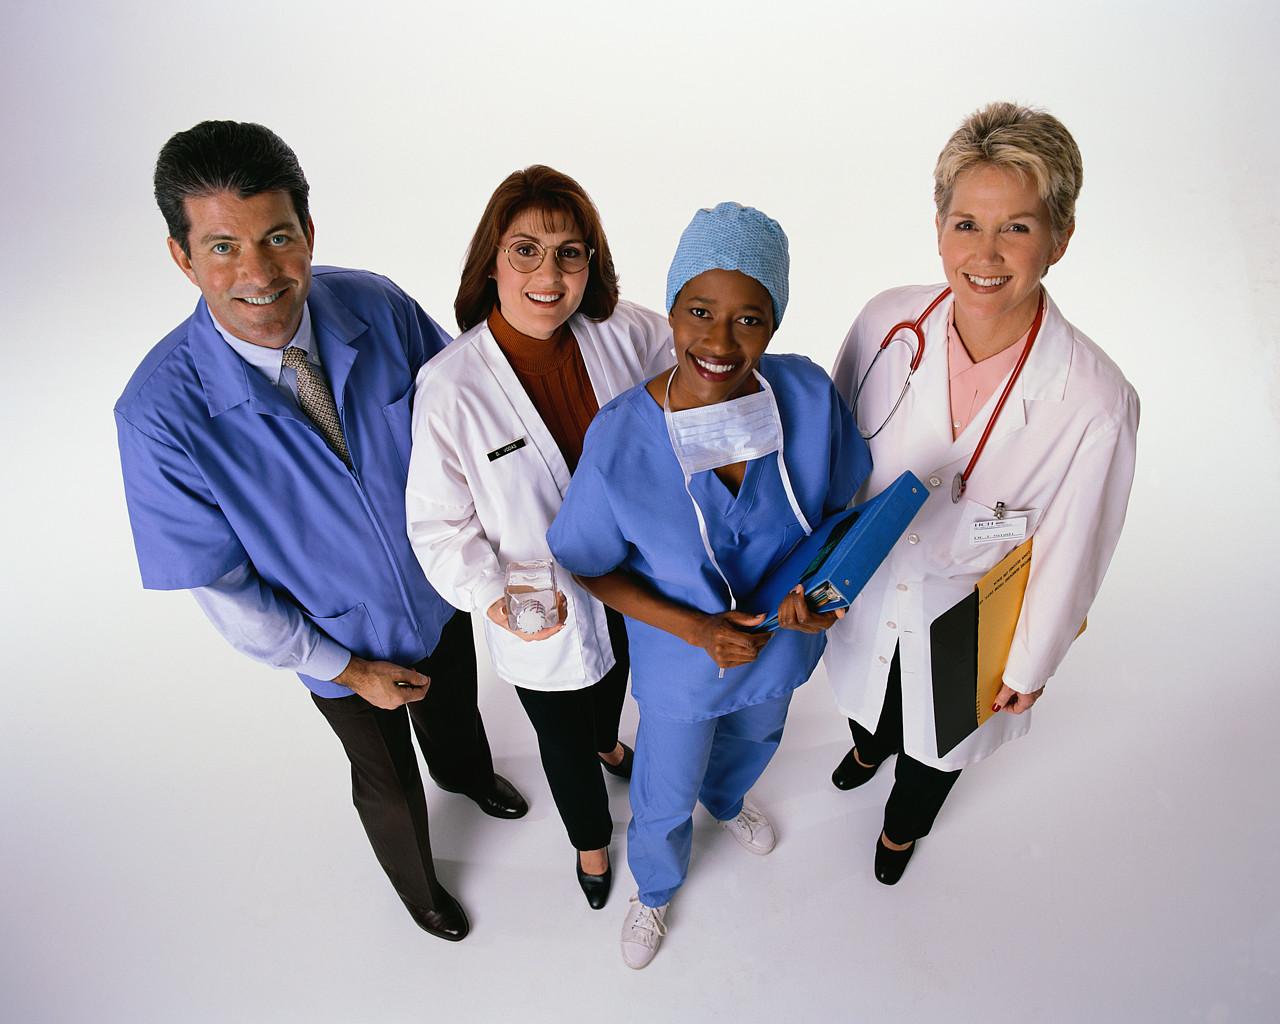 Doctors looking upwards excitedly.jpg